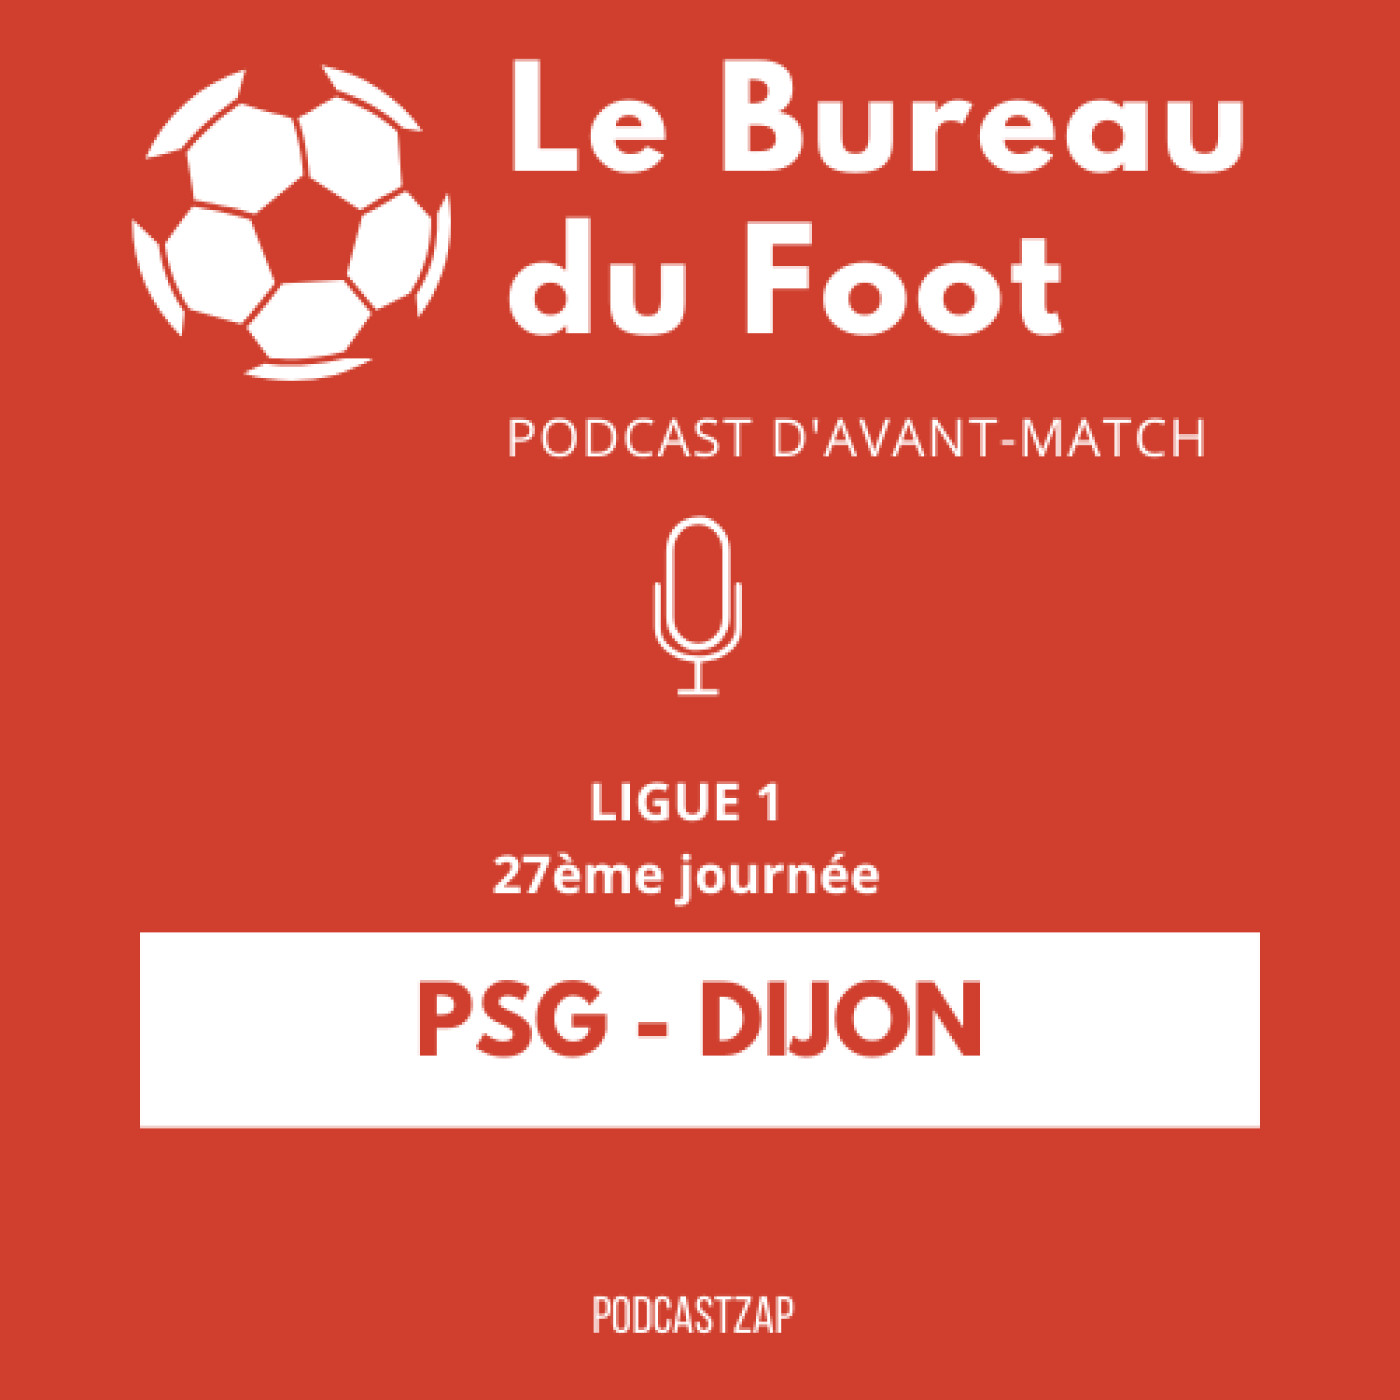 S1E12 - Ligue 1 - Journée 27 - PSG-Dijon